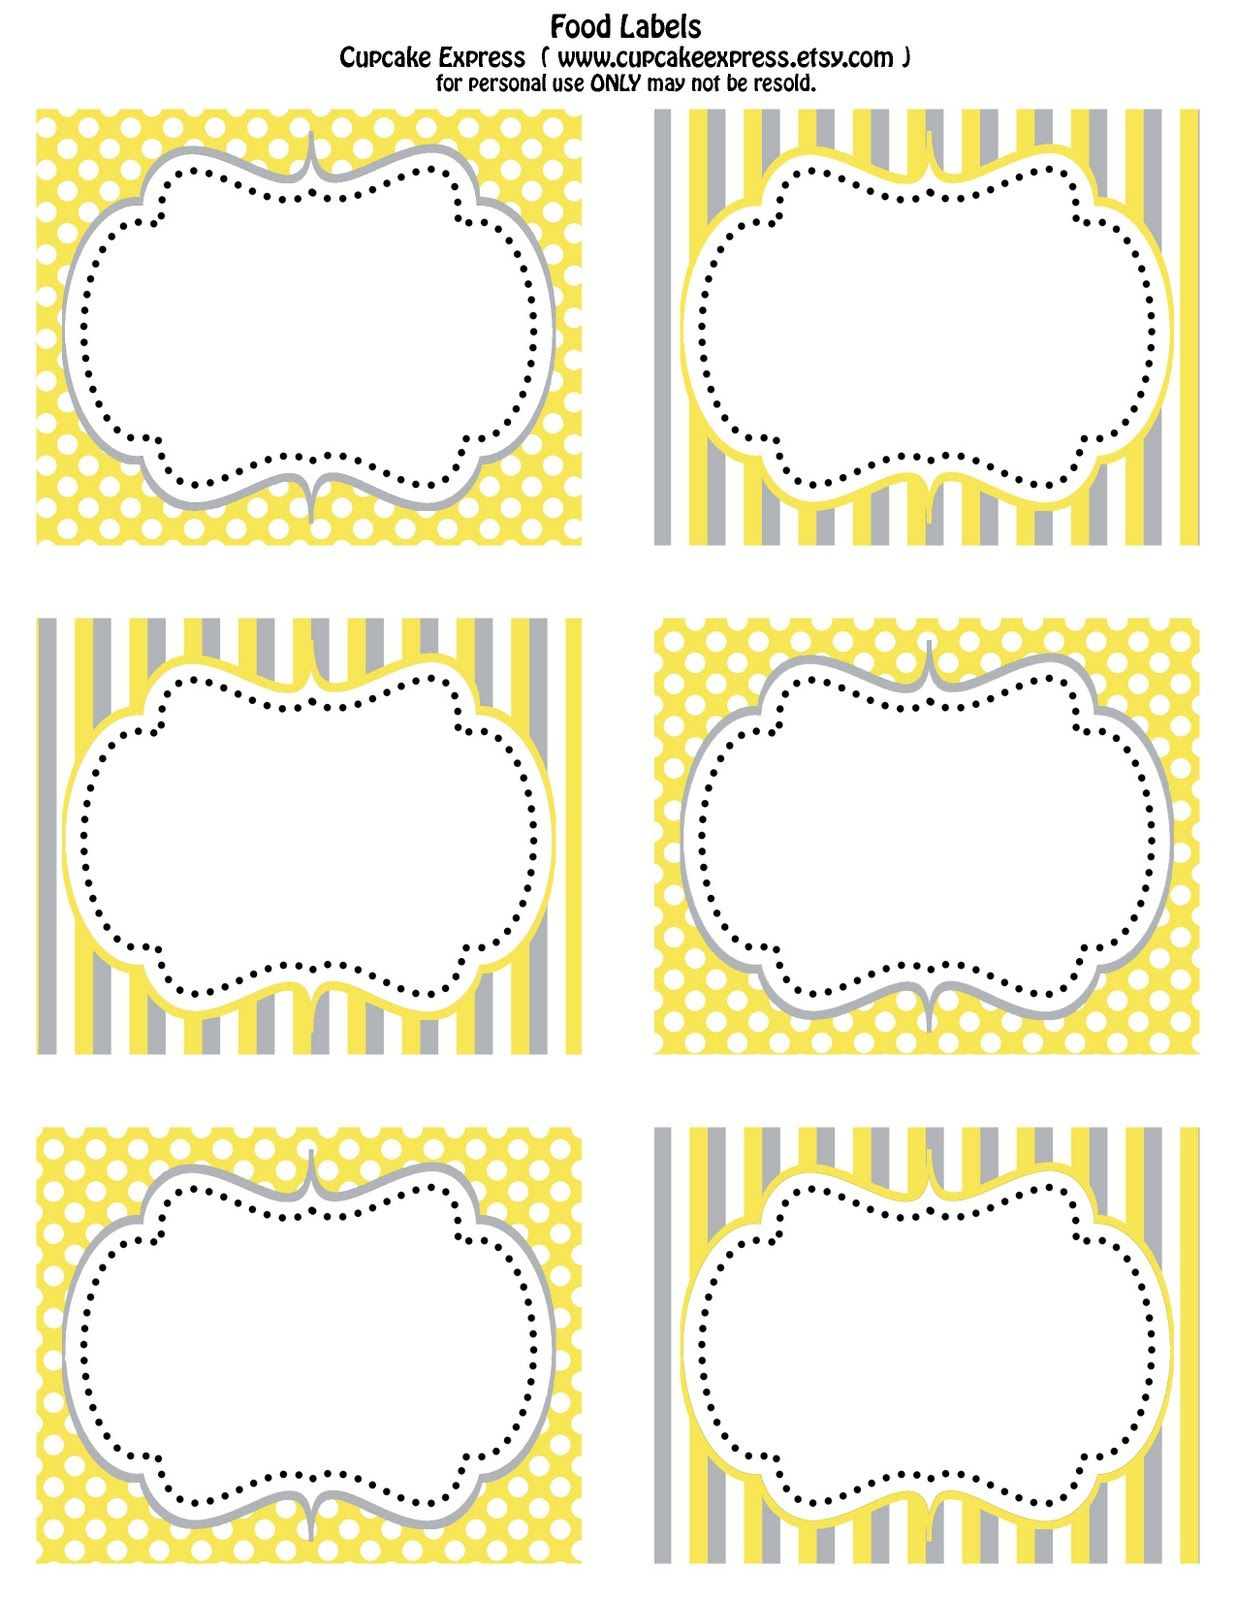 cupcake express: free printable yellow and grey food labels& cupcake